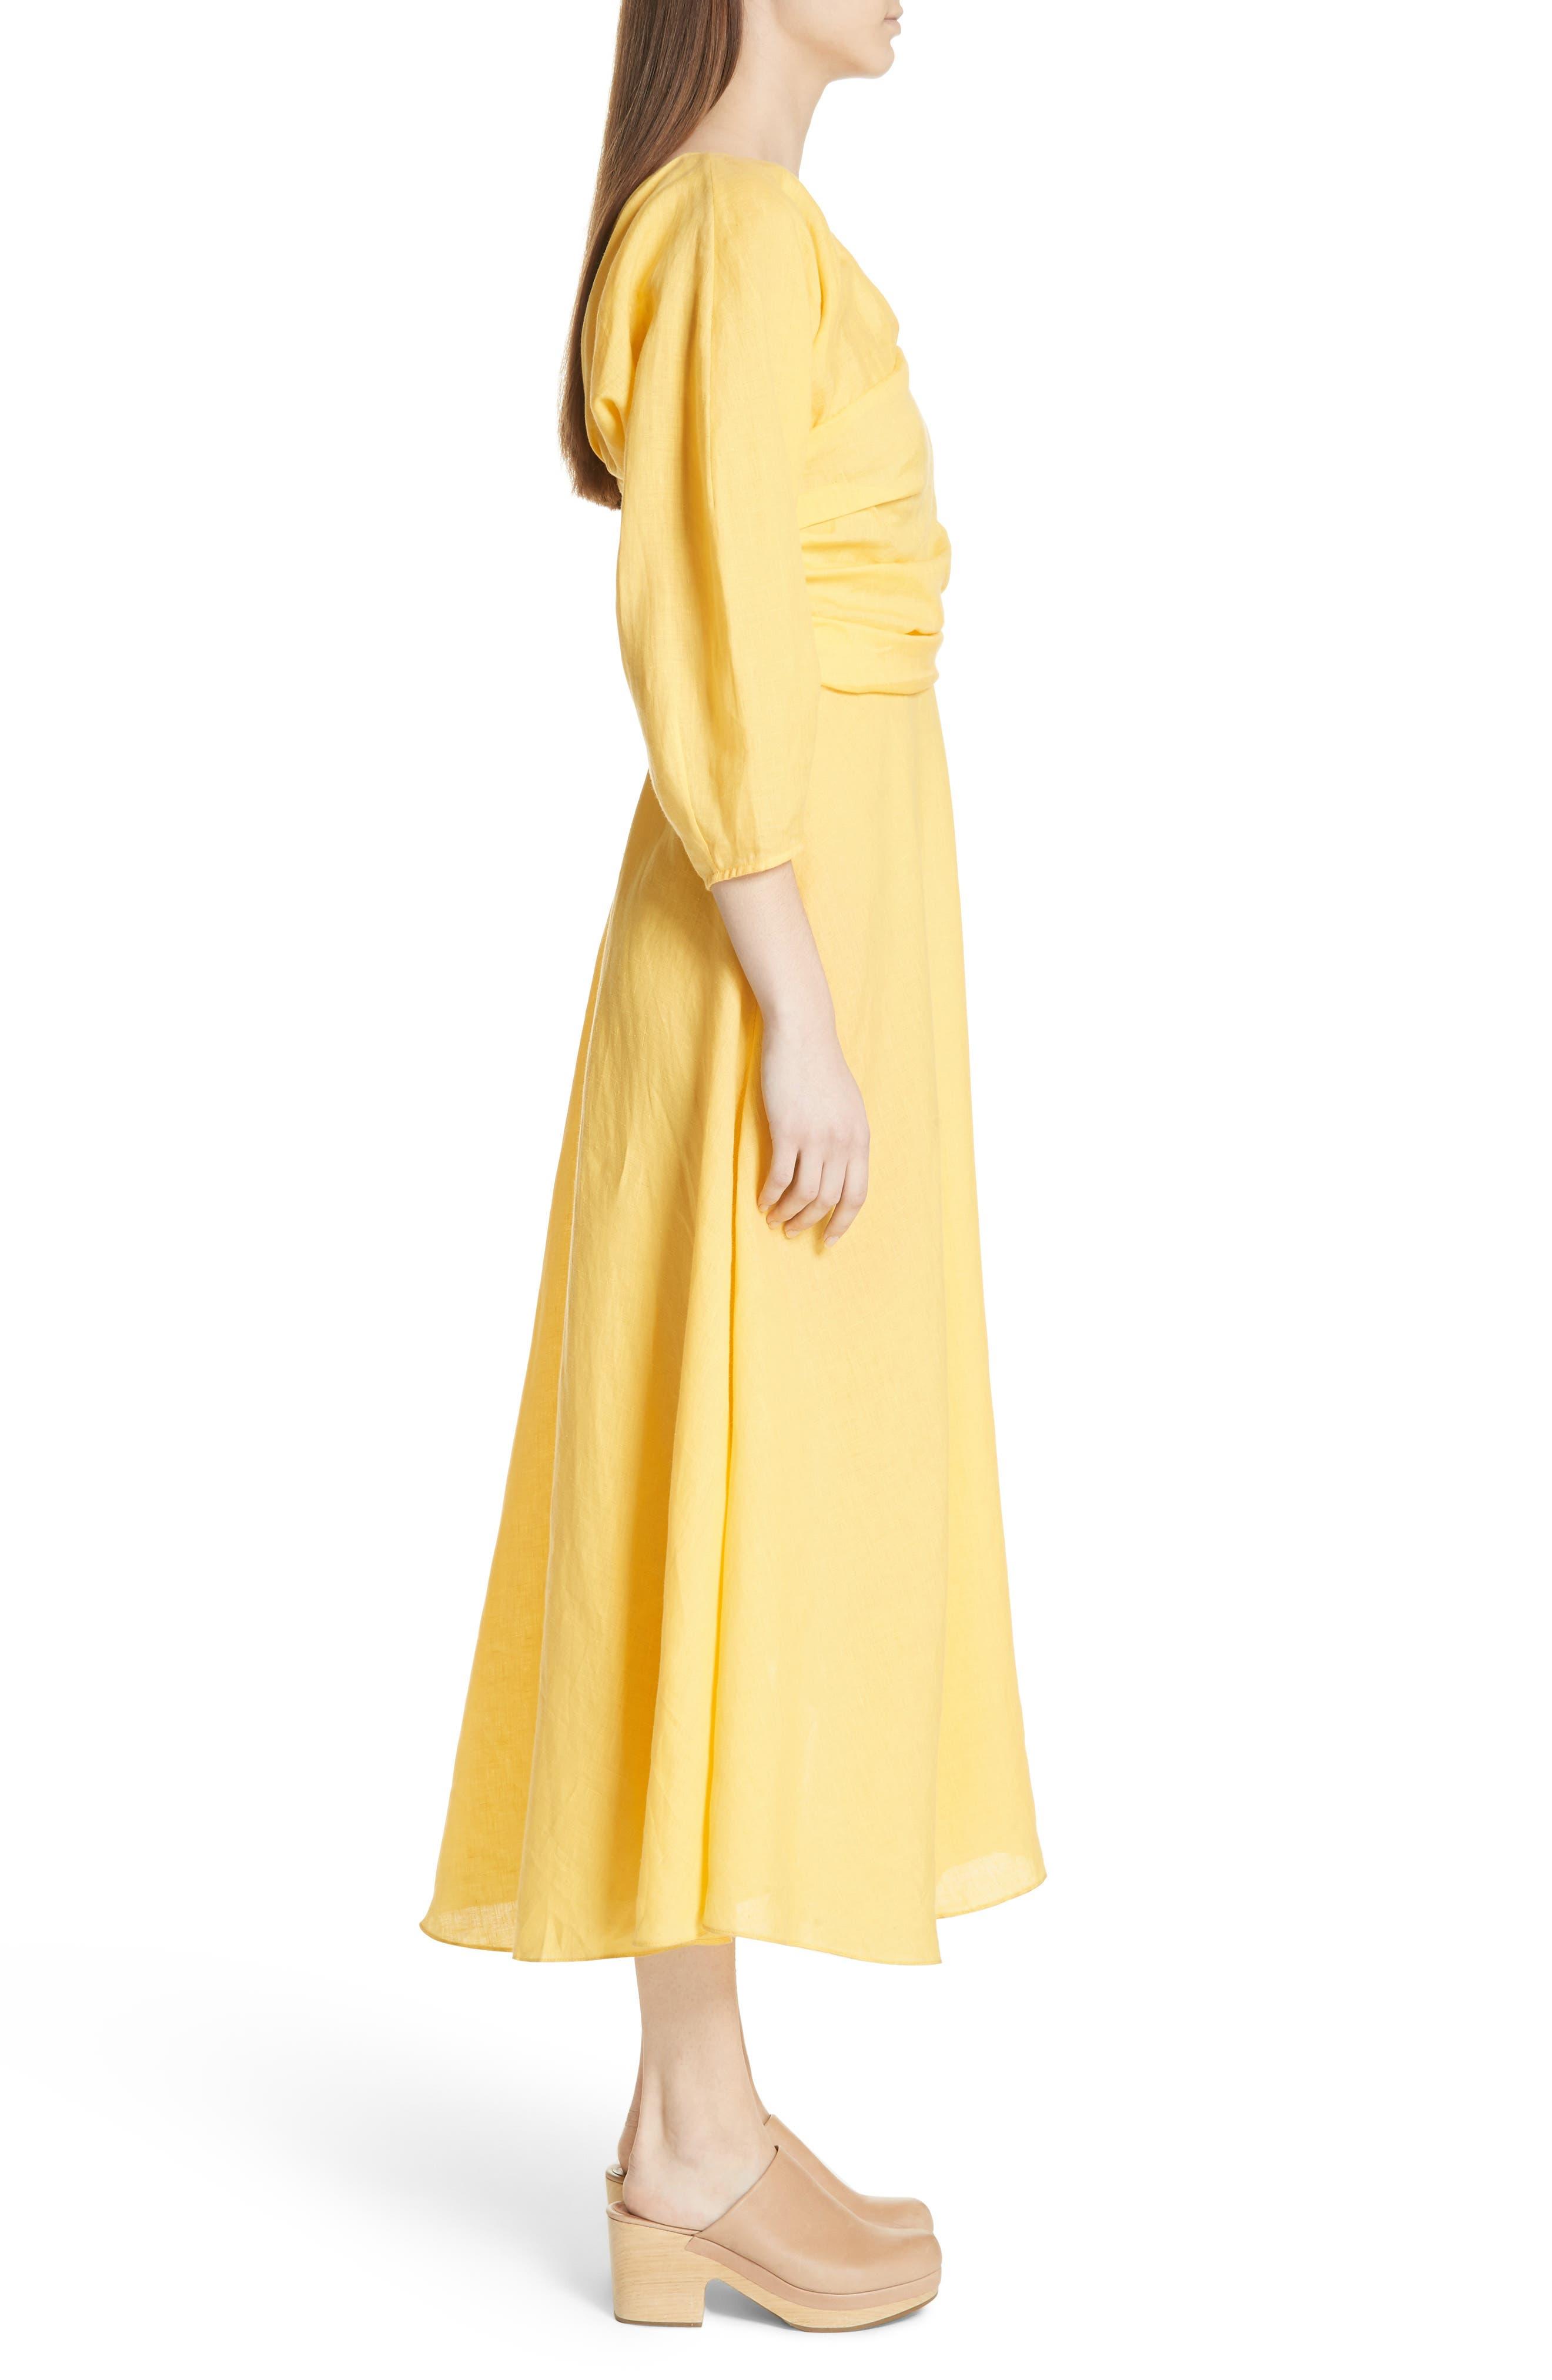 Tipple One-Shoulder Dress,                             Alternate thumbnail 3, color,                             YELLOW